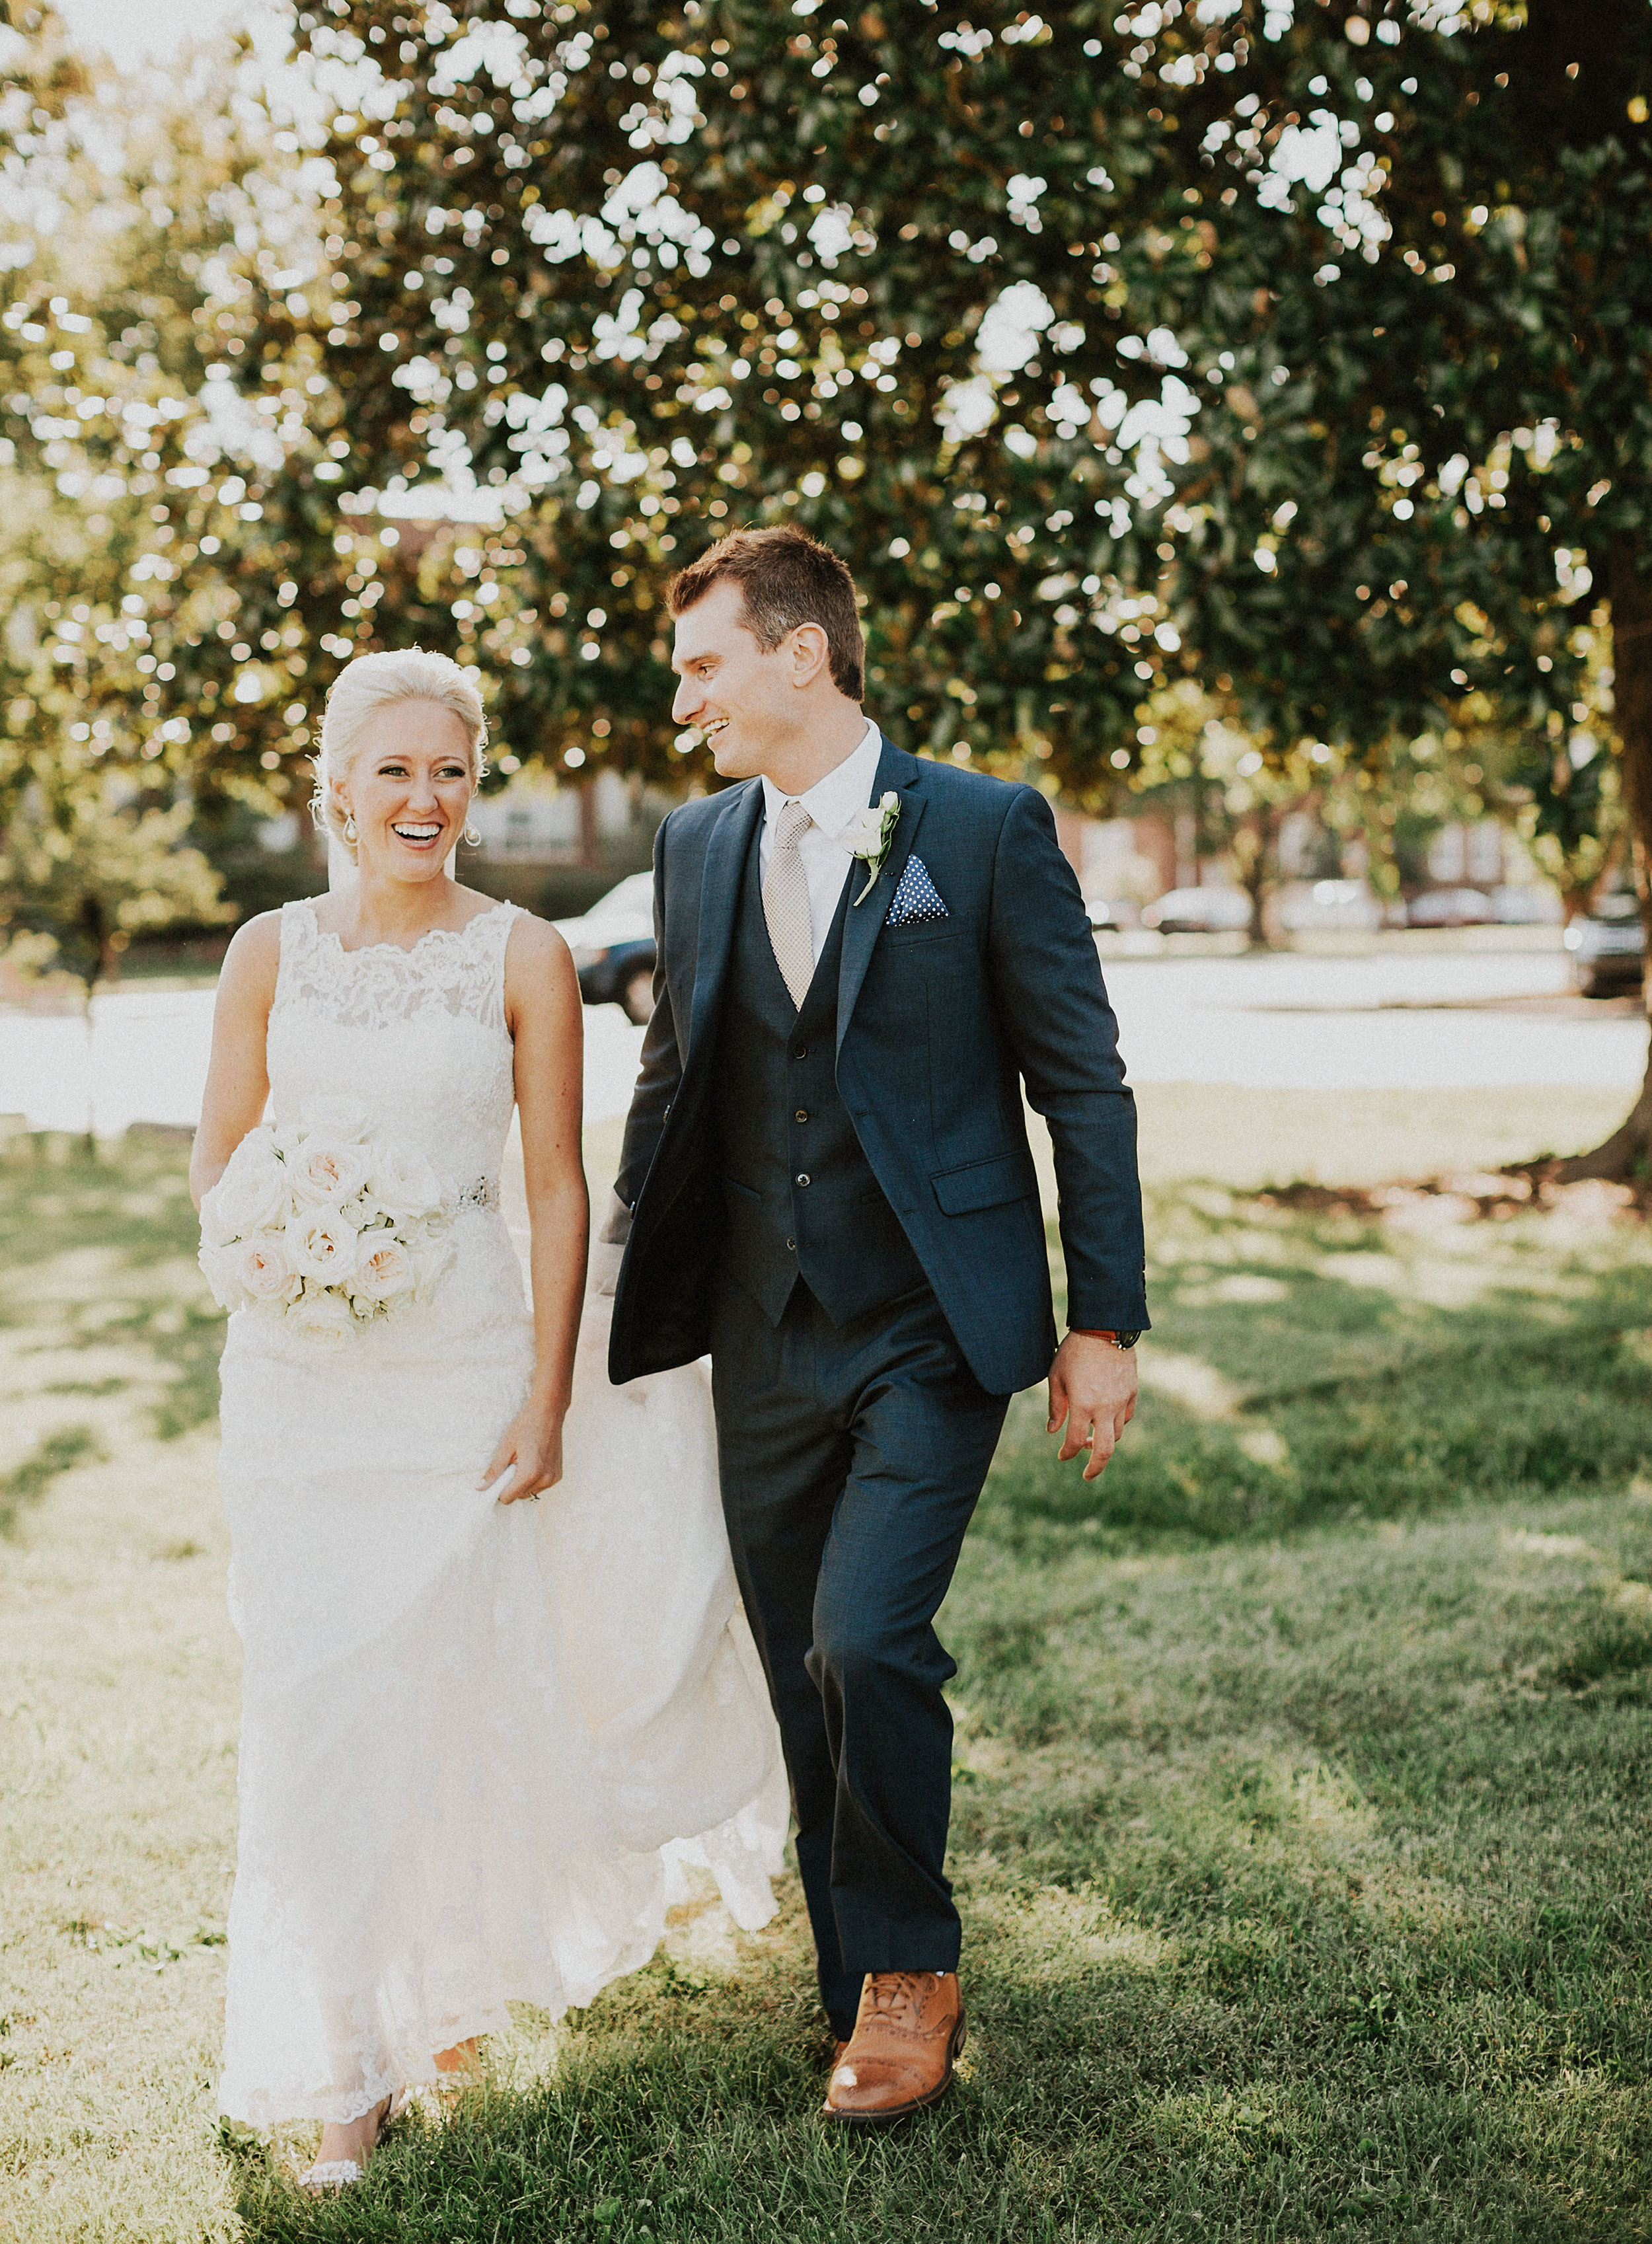 olmsted-wedding-louisville-kentucky-032.JPG